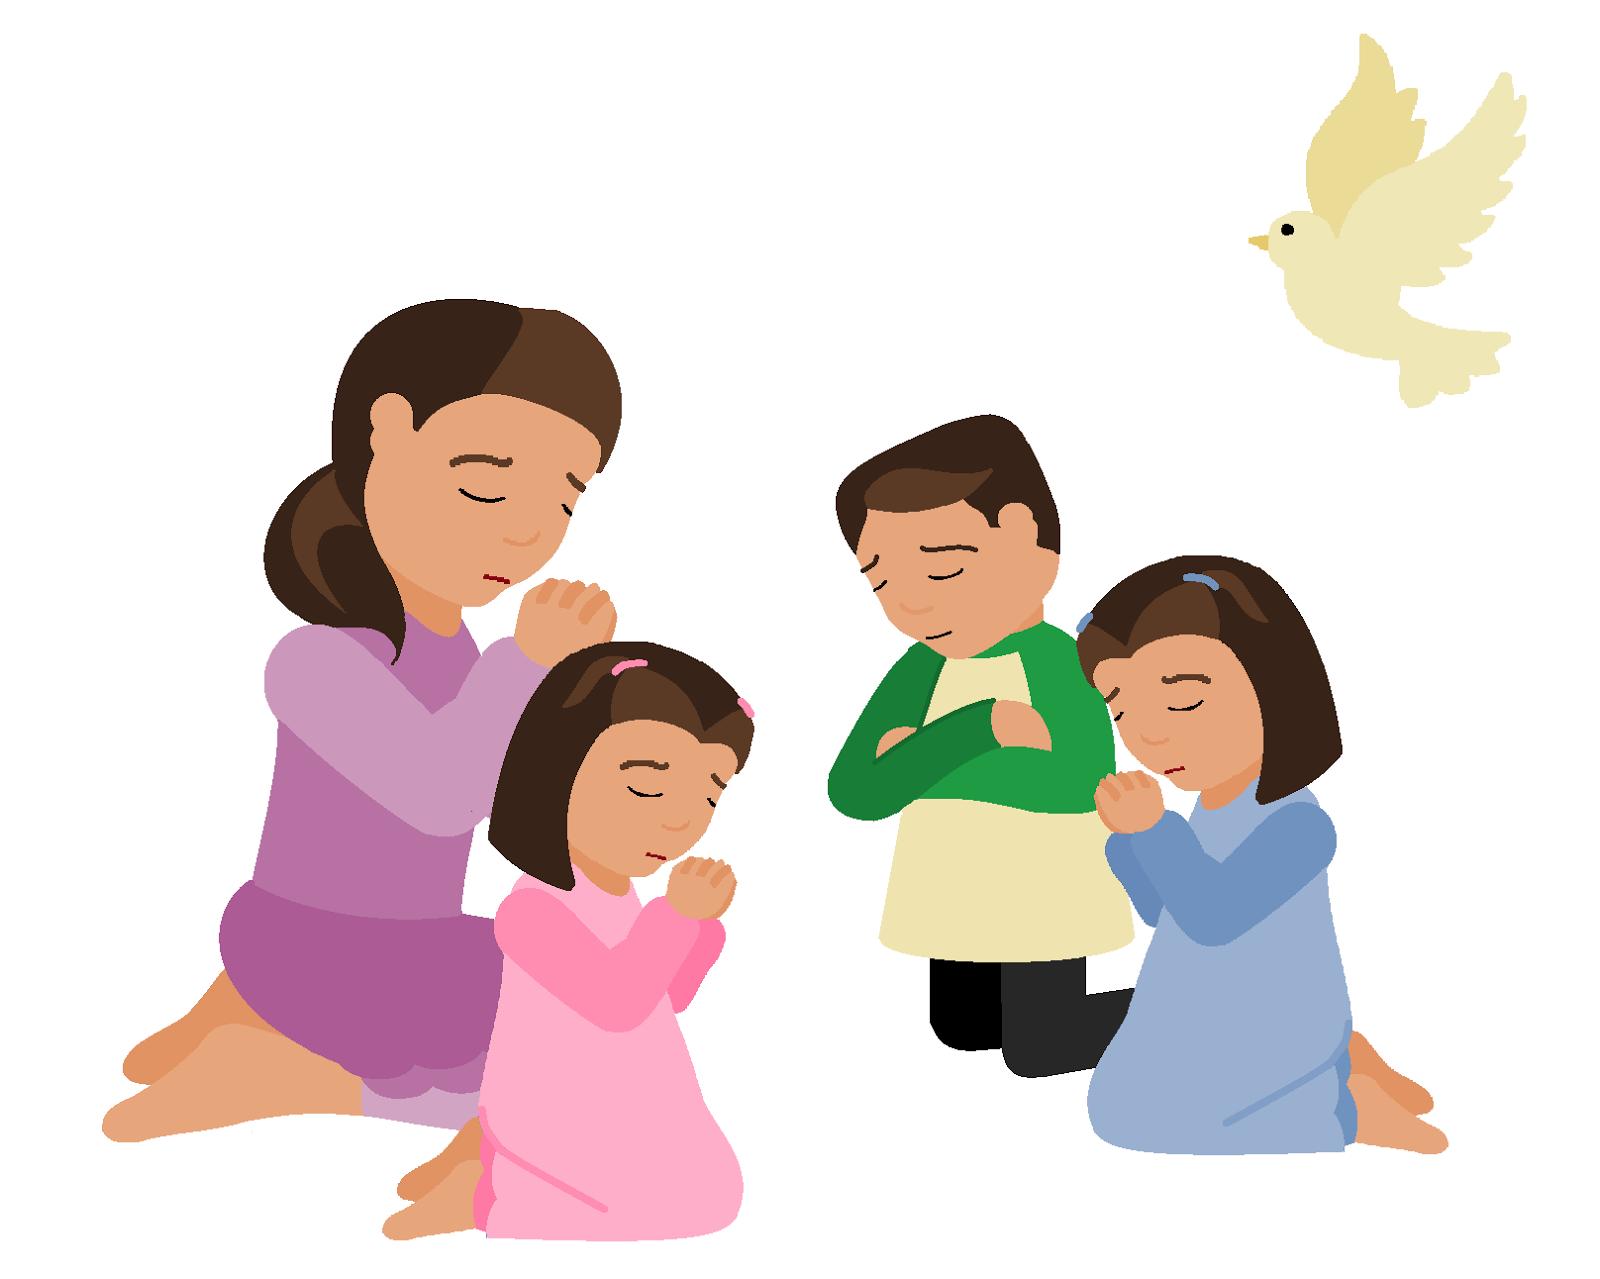 children praying clipart - photo #5